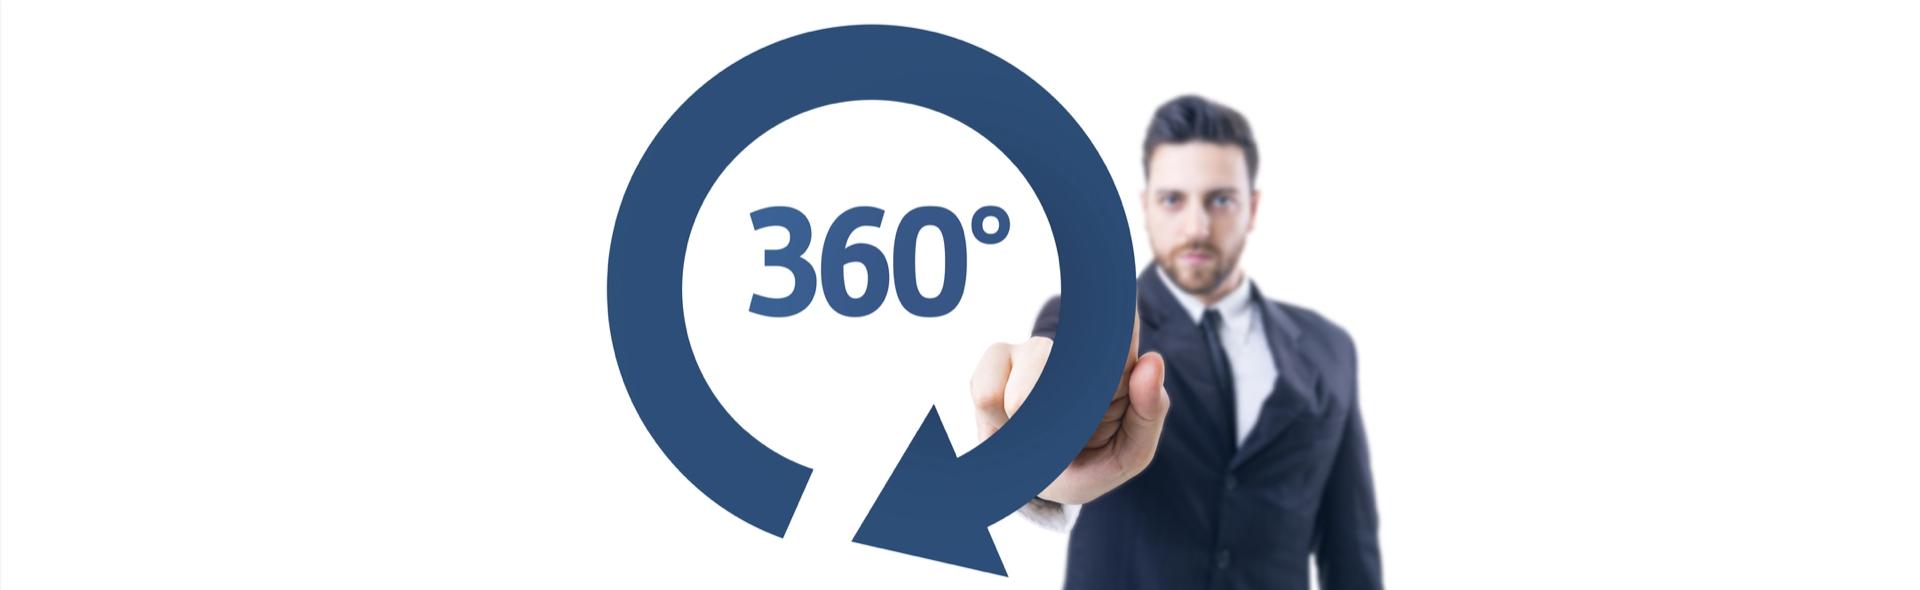 BANNER PRINCIPAL 360°.001.jpeg